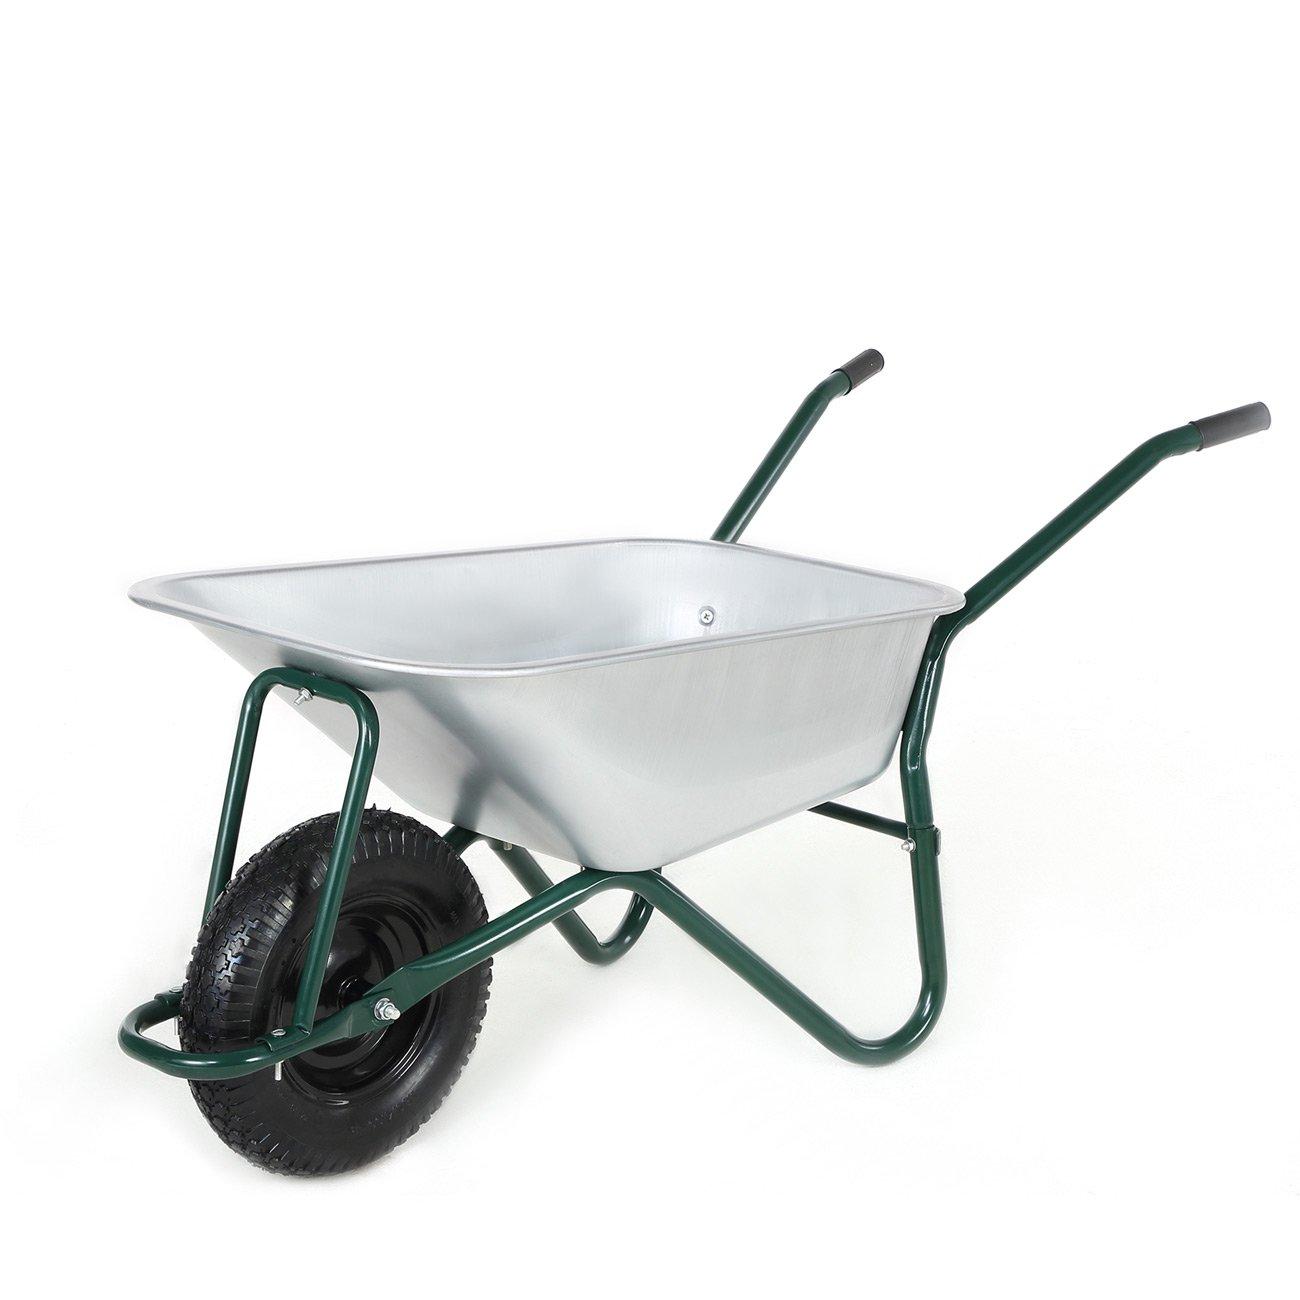 MAXCRAFT Wheelbarrow Garden Cart 100 L 200 kg Tool Gear Wagon Heavy Duty Garden Barrow Pneumatic Tire in Green